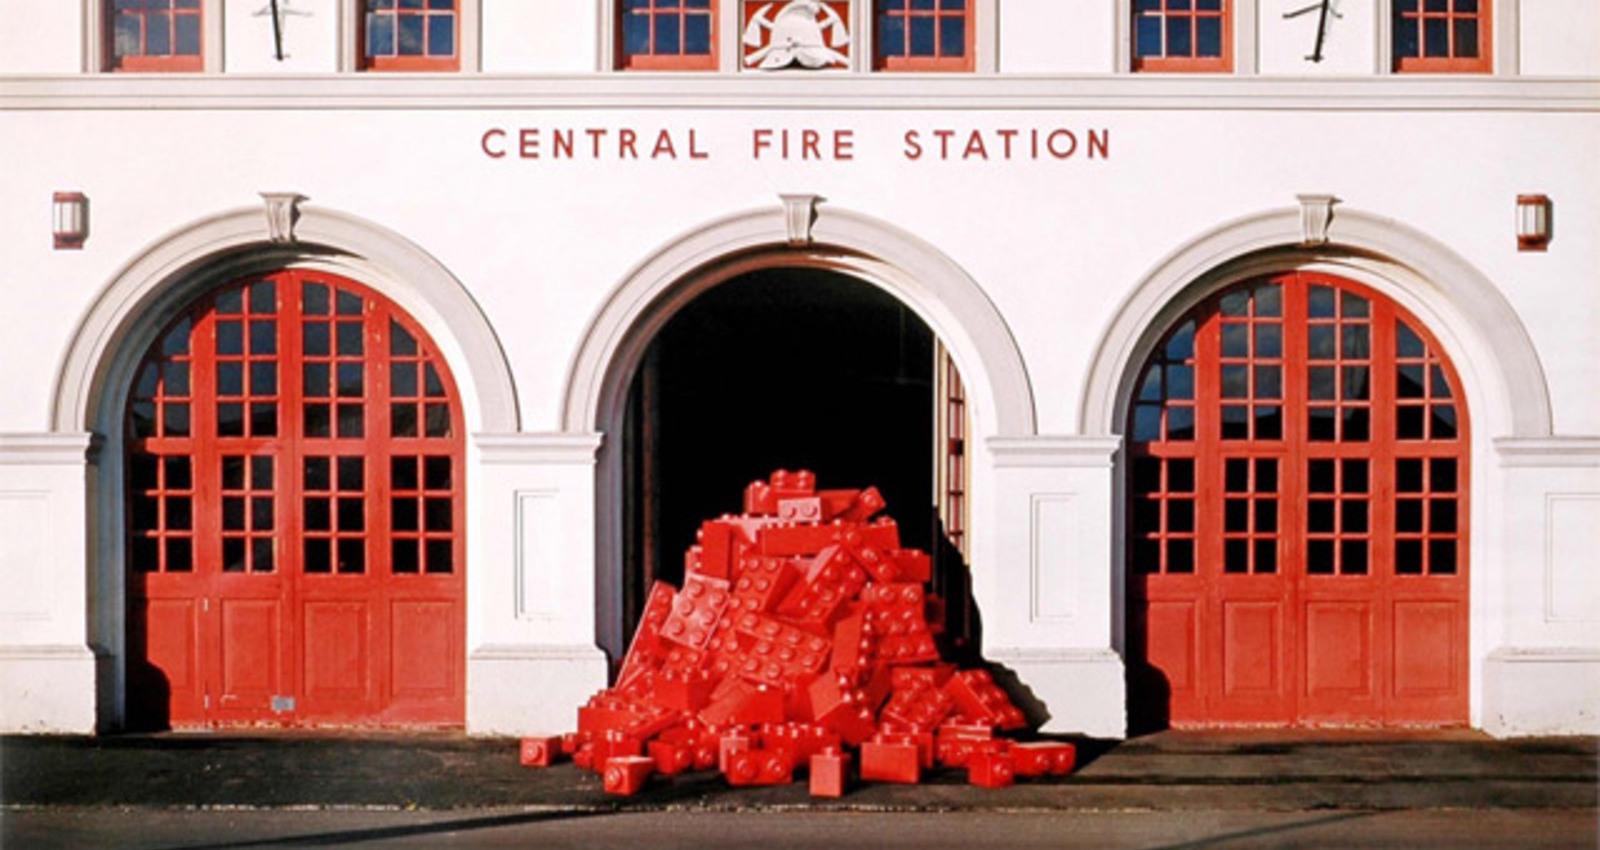 Lego - Fire Station